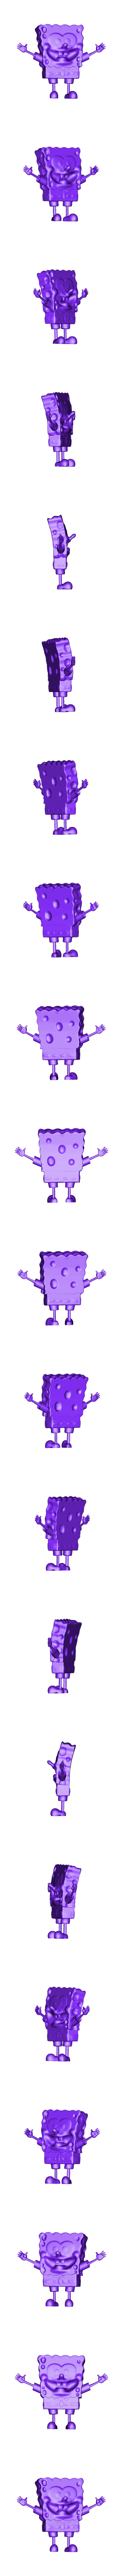 Bob Esponja2.stl Download STL file Sponge Bob • 3D printing design, Alex46